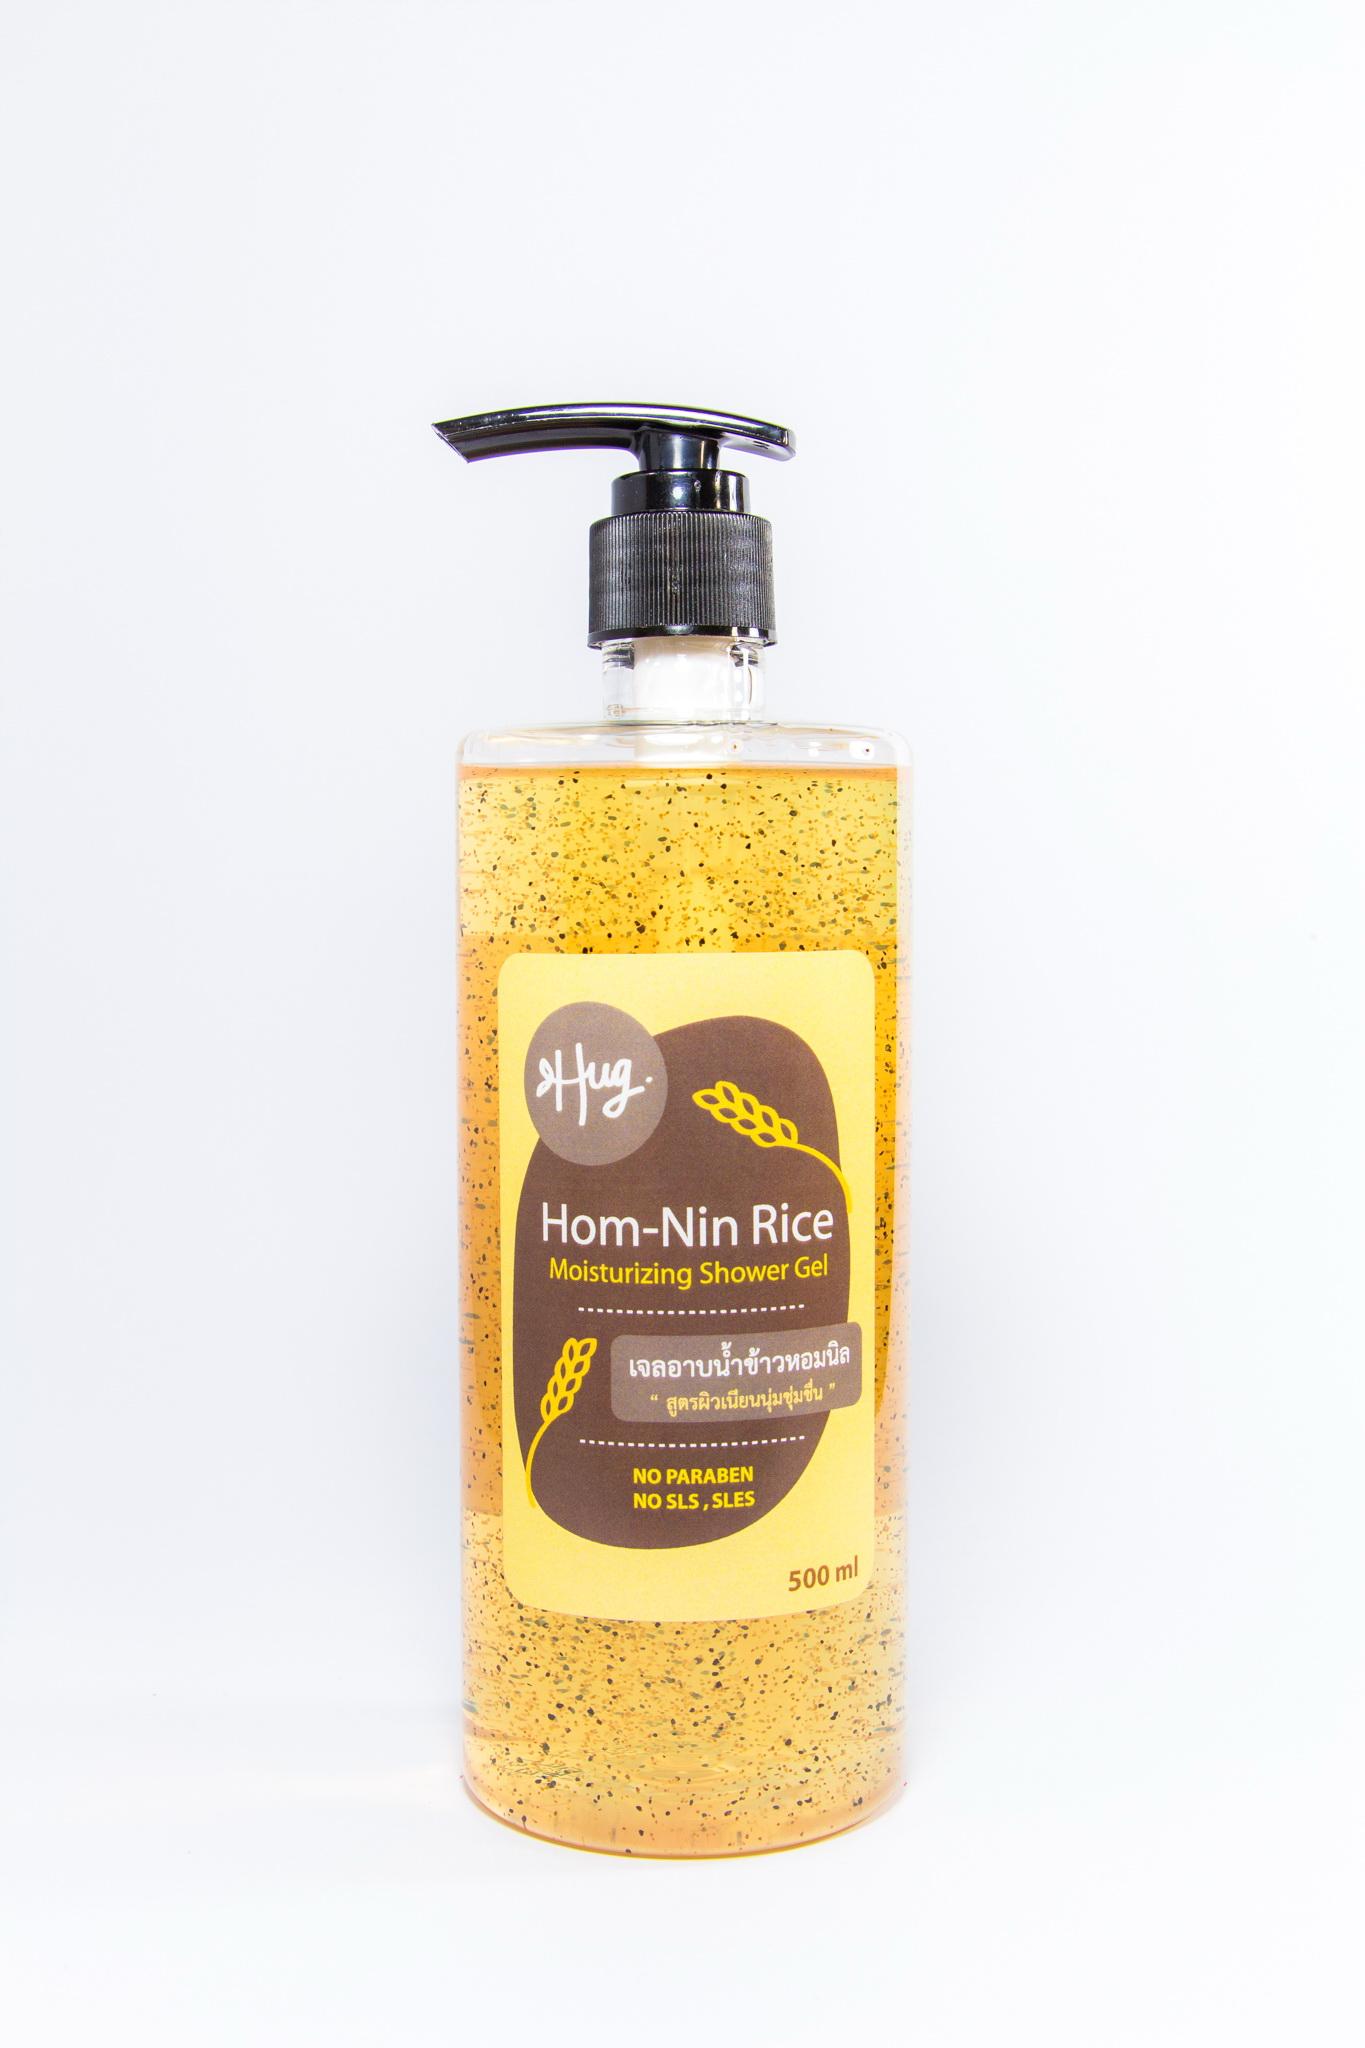 Hom-Nin Rice Moisturizing Shower Gel 500 ml (สบู่เหลวผสมสครับข้าวหอมนิล)